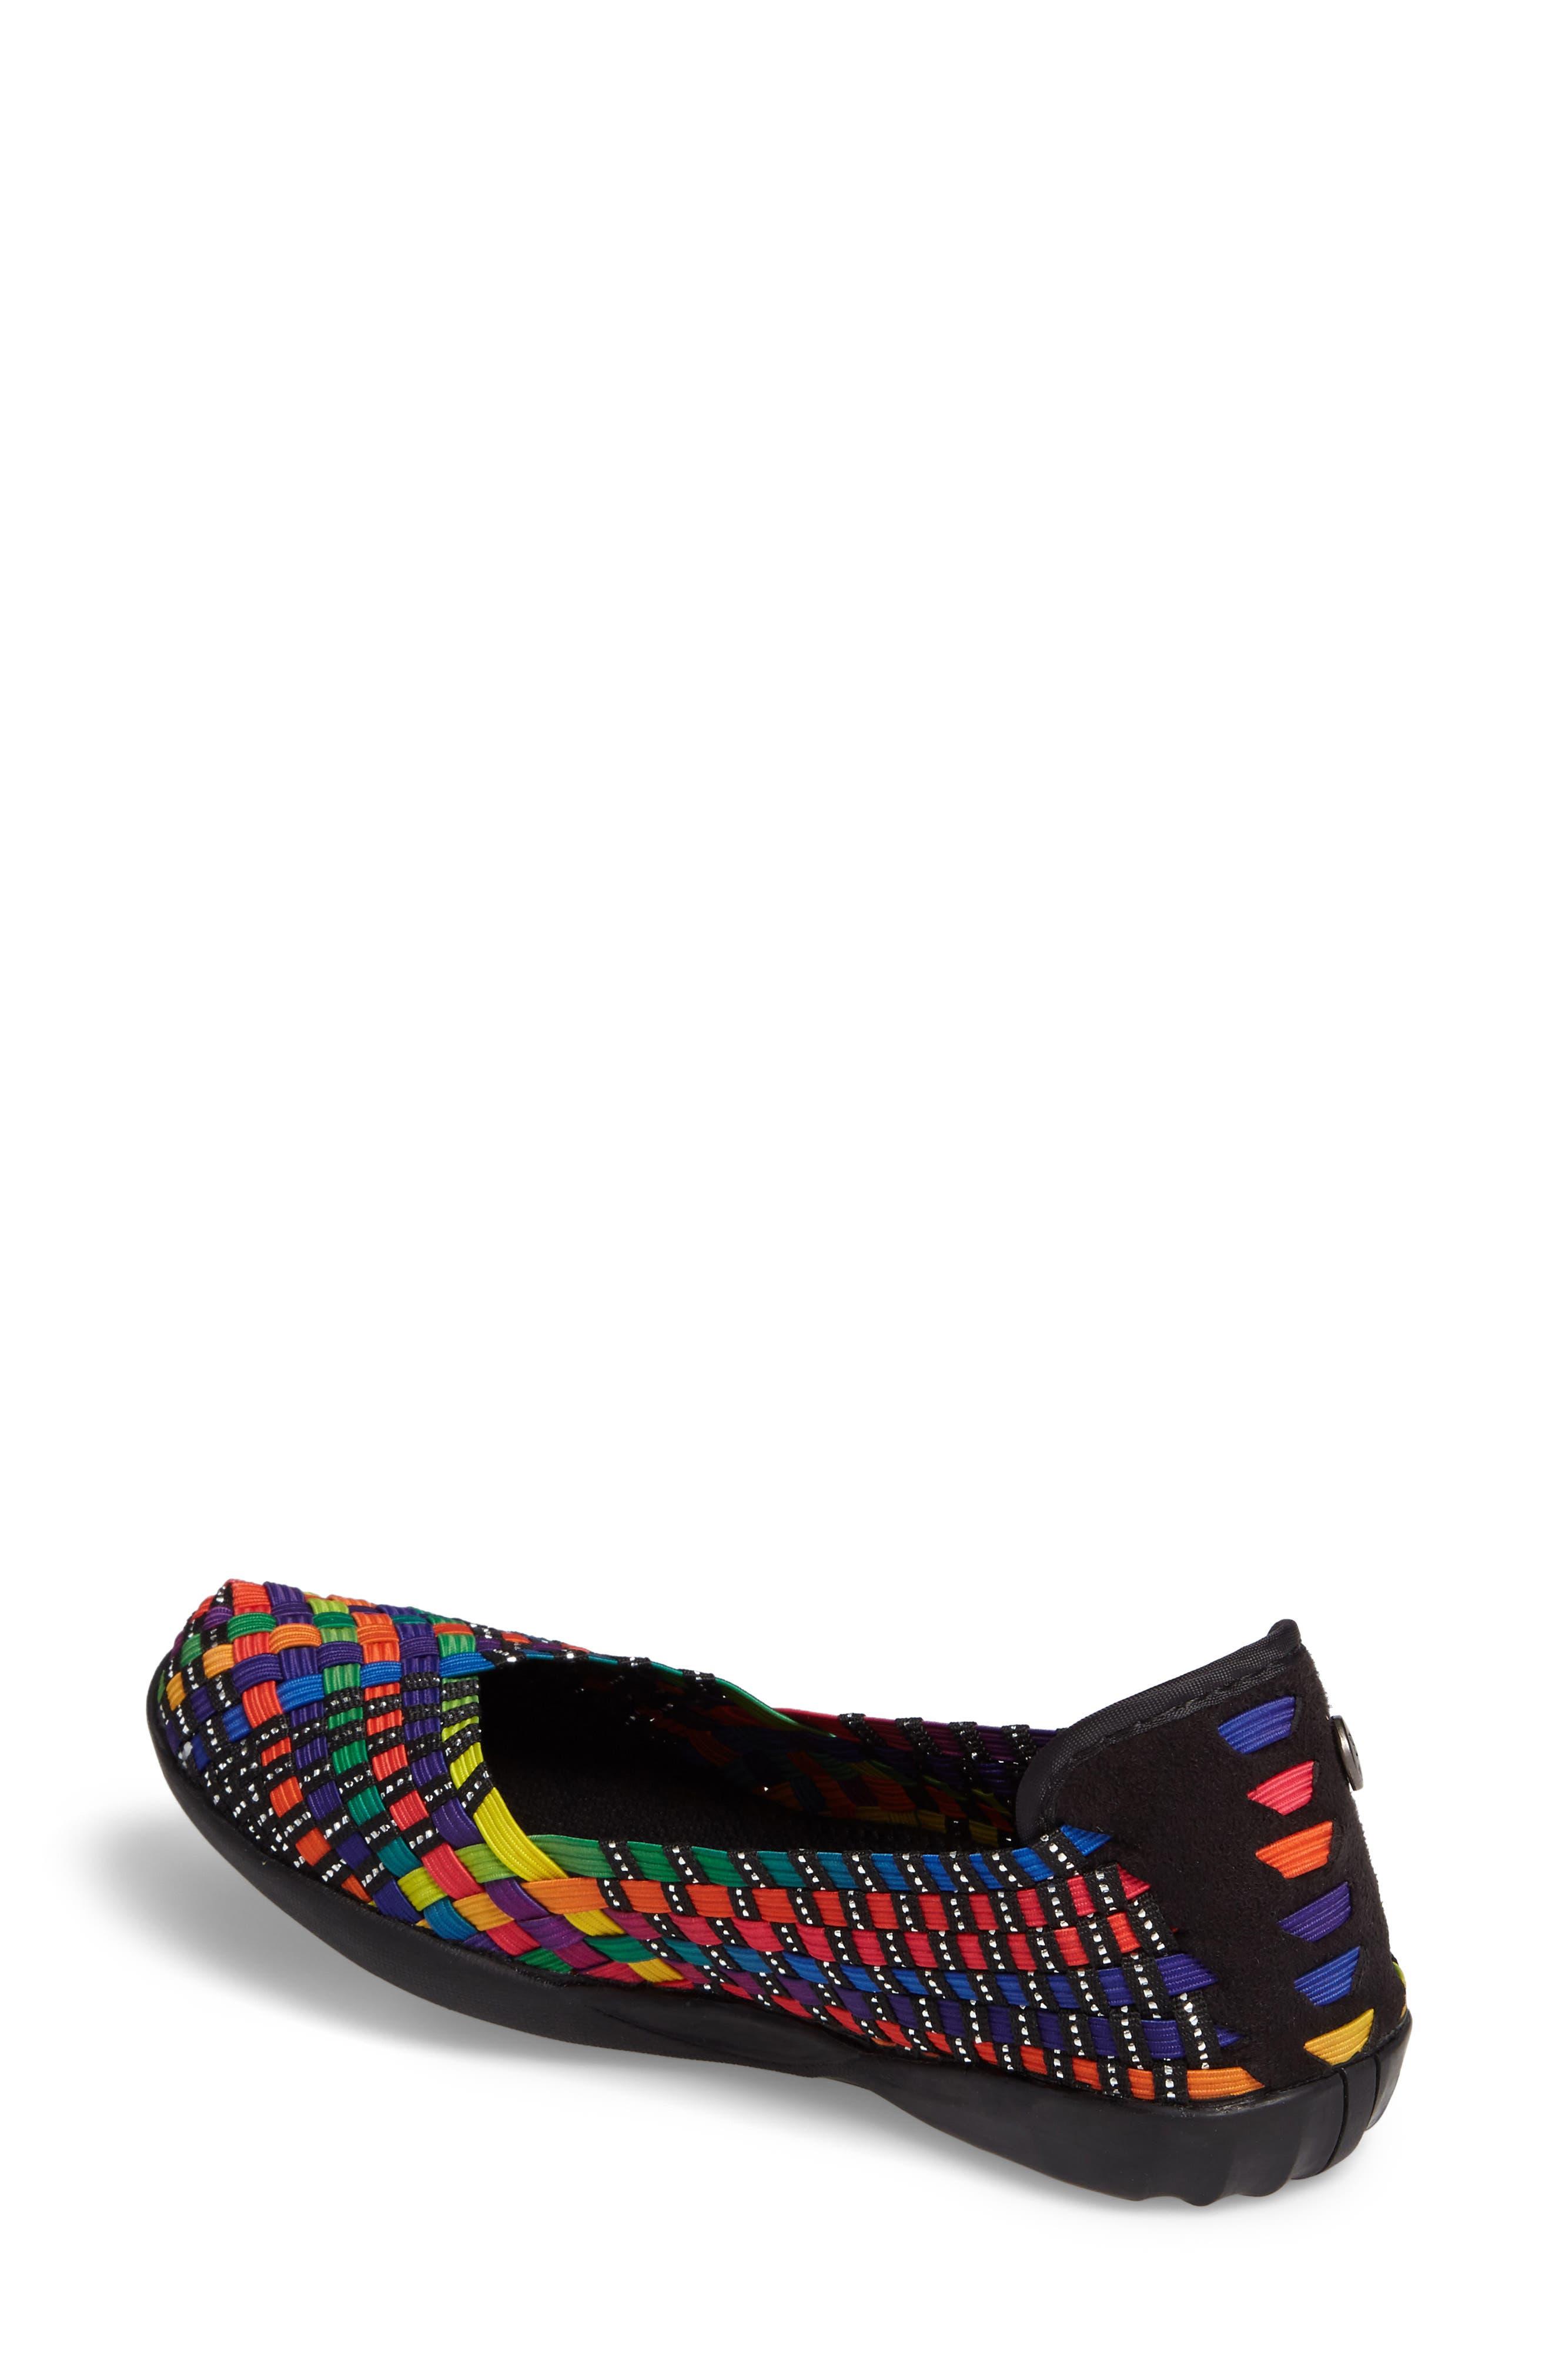 Catwalk Sneaker,                             Alternate thumbnail 2, color,                             Black Multi